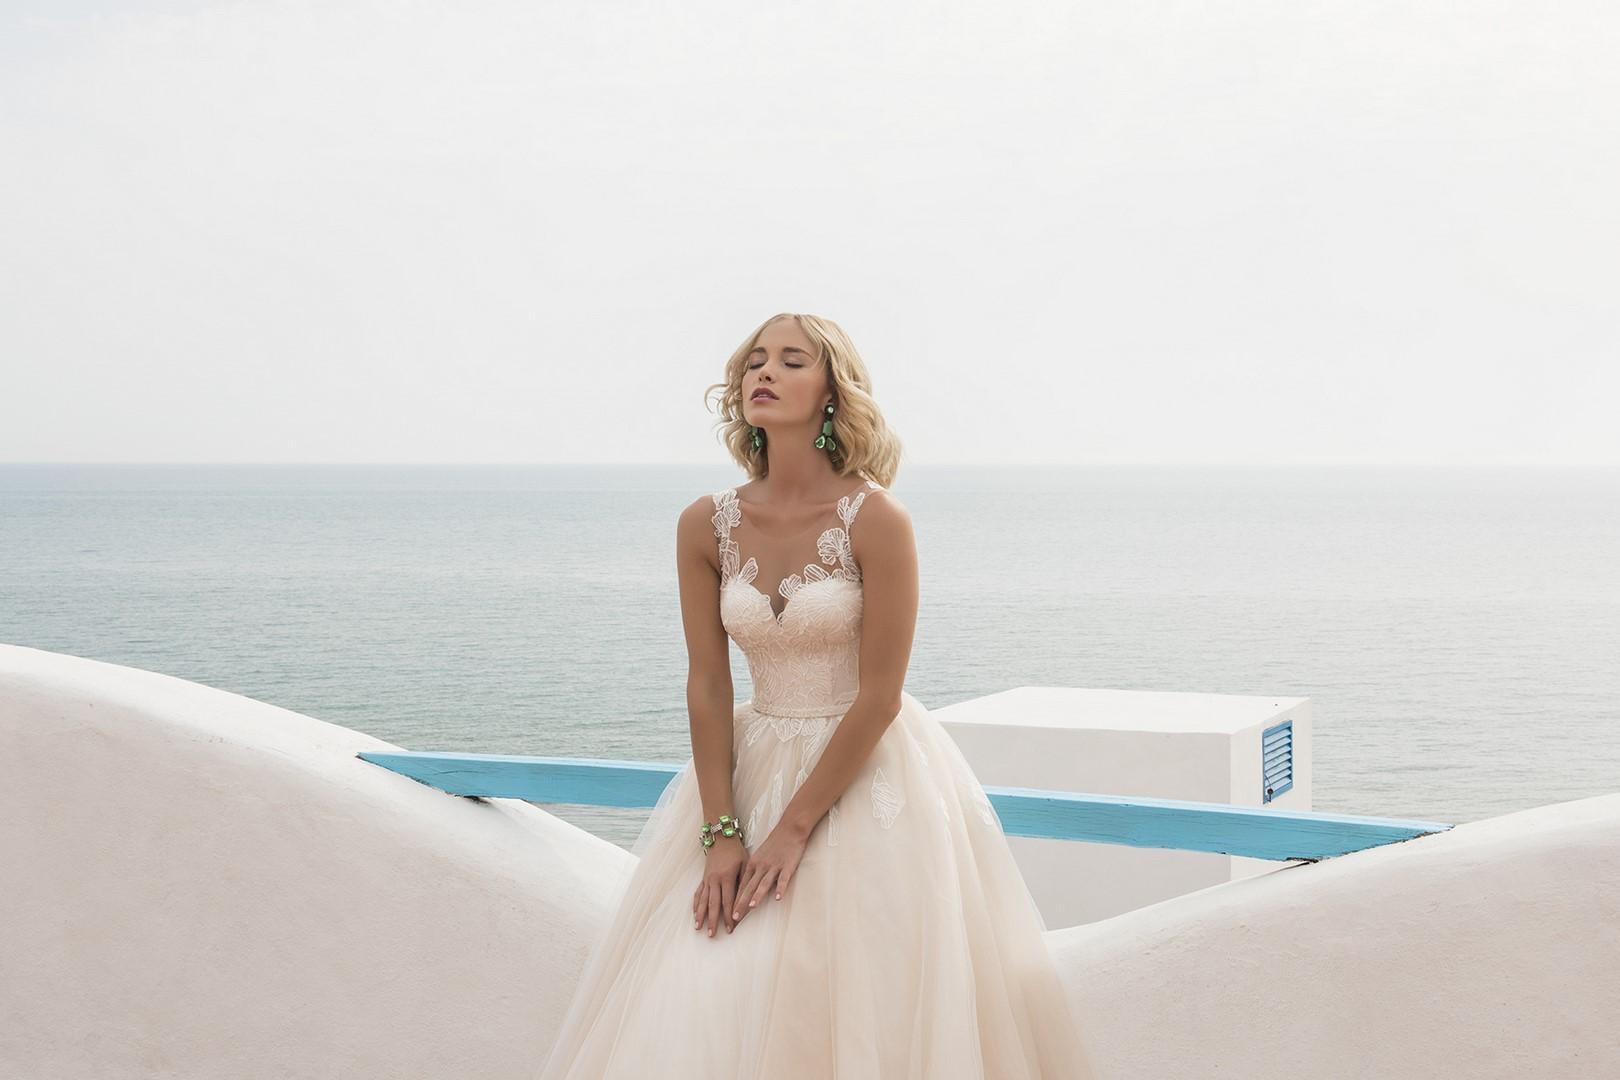 Anastasia-Jillian Elianto-0900-WEB Jillian Abiti da sposa Collezione 2020.jpg